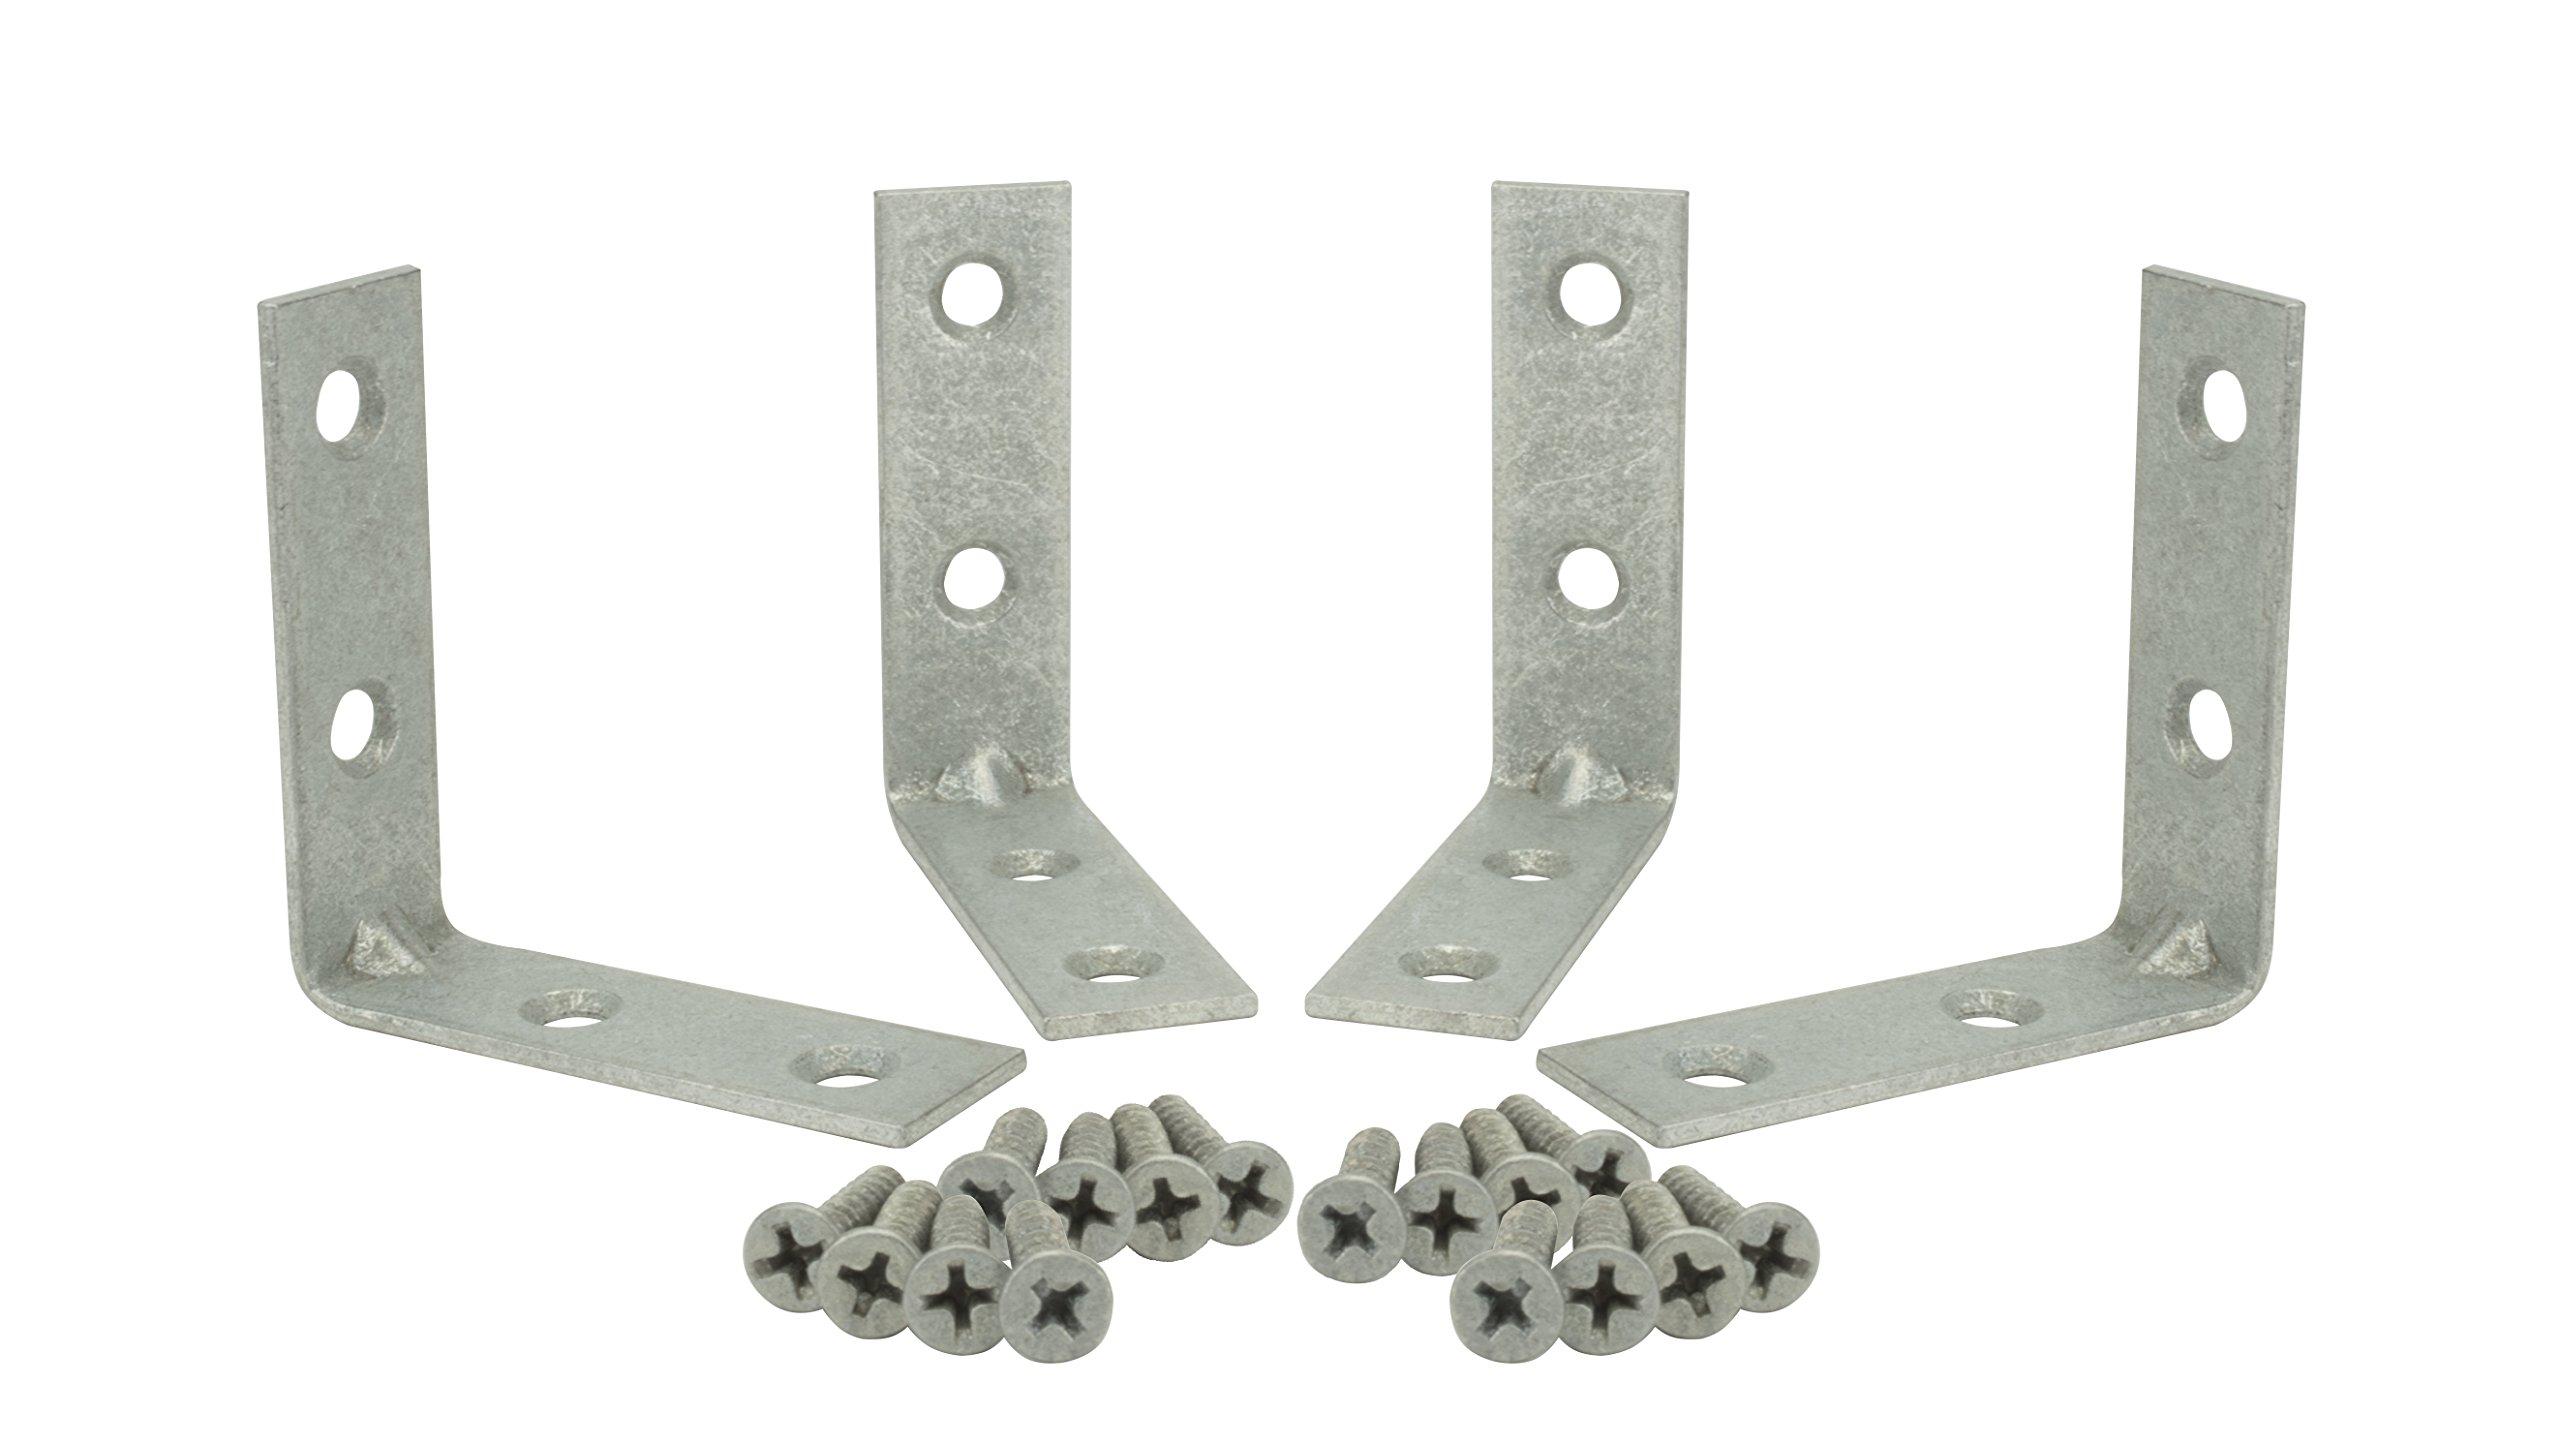 Specialty Hardware Corner Brace 2 inch Galvanized 120pcs